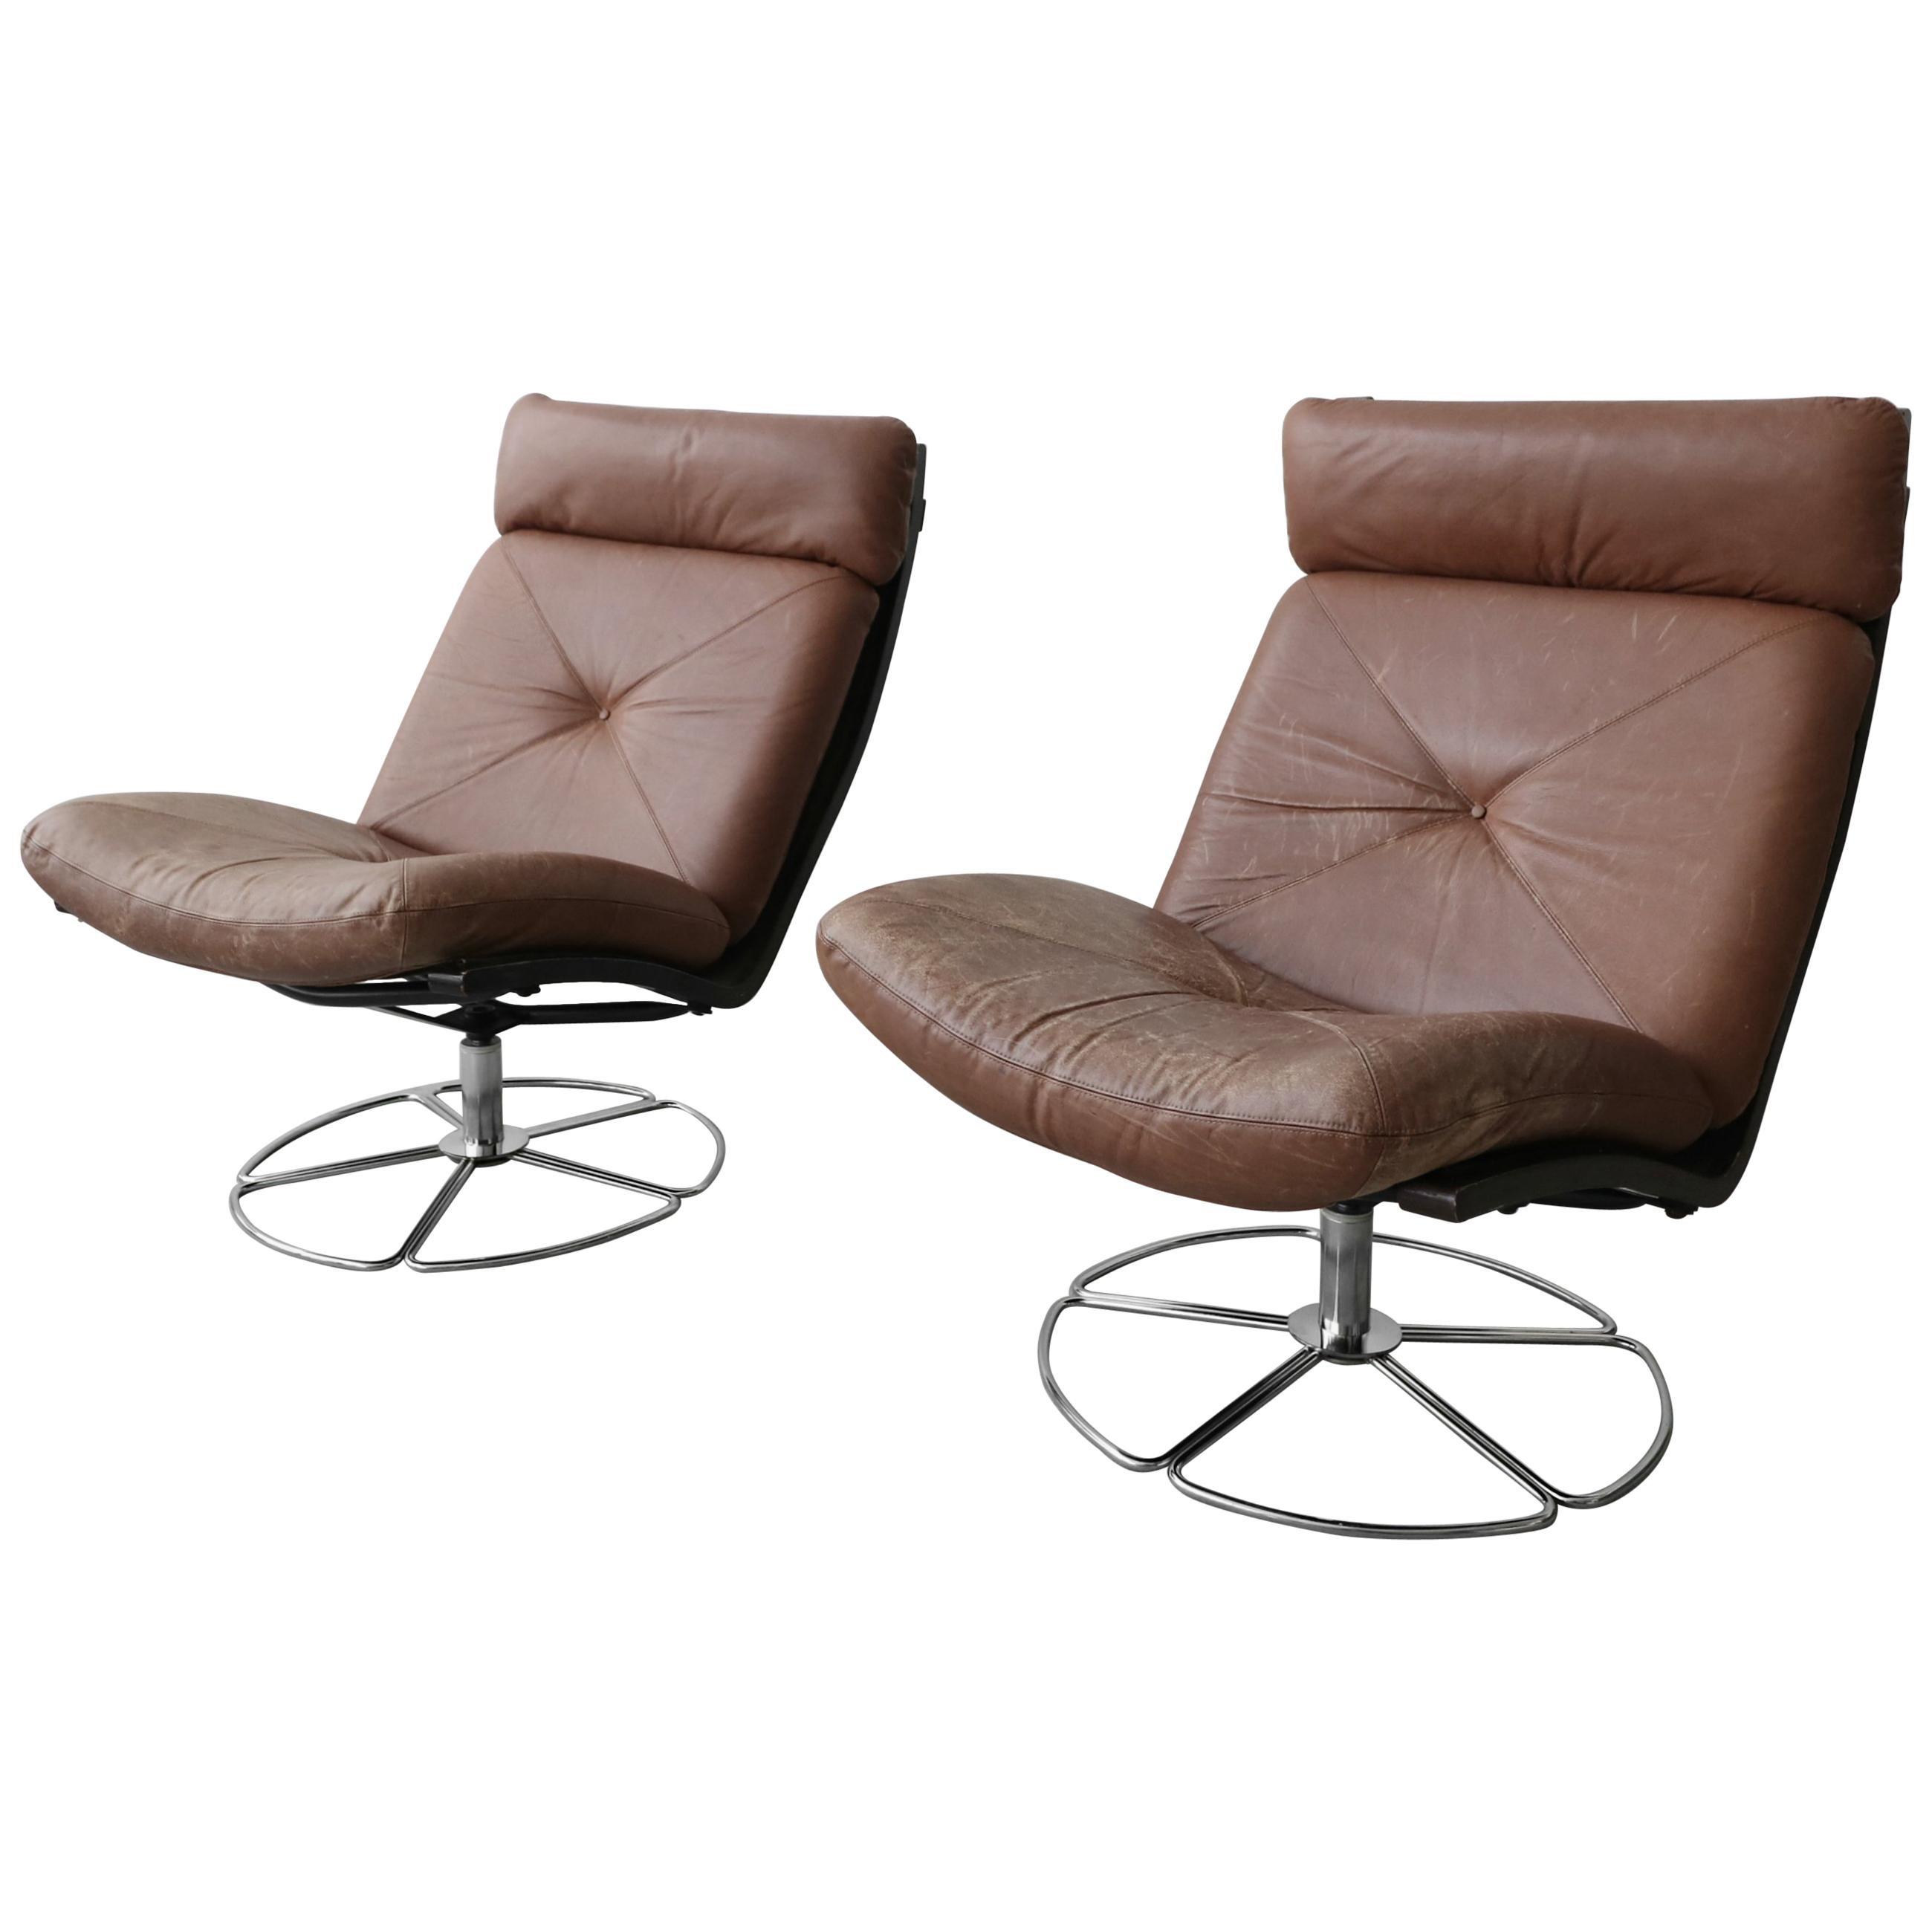 Cool Pair Of Midcentury Leather And Chrome Armless Swivel Danish Style Lounge Chairs Creativecarmelina Interior Chair Design Creativecarmelinacom